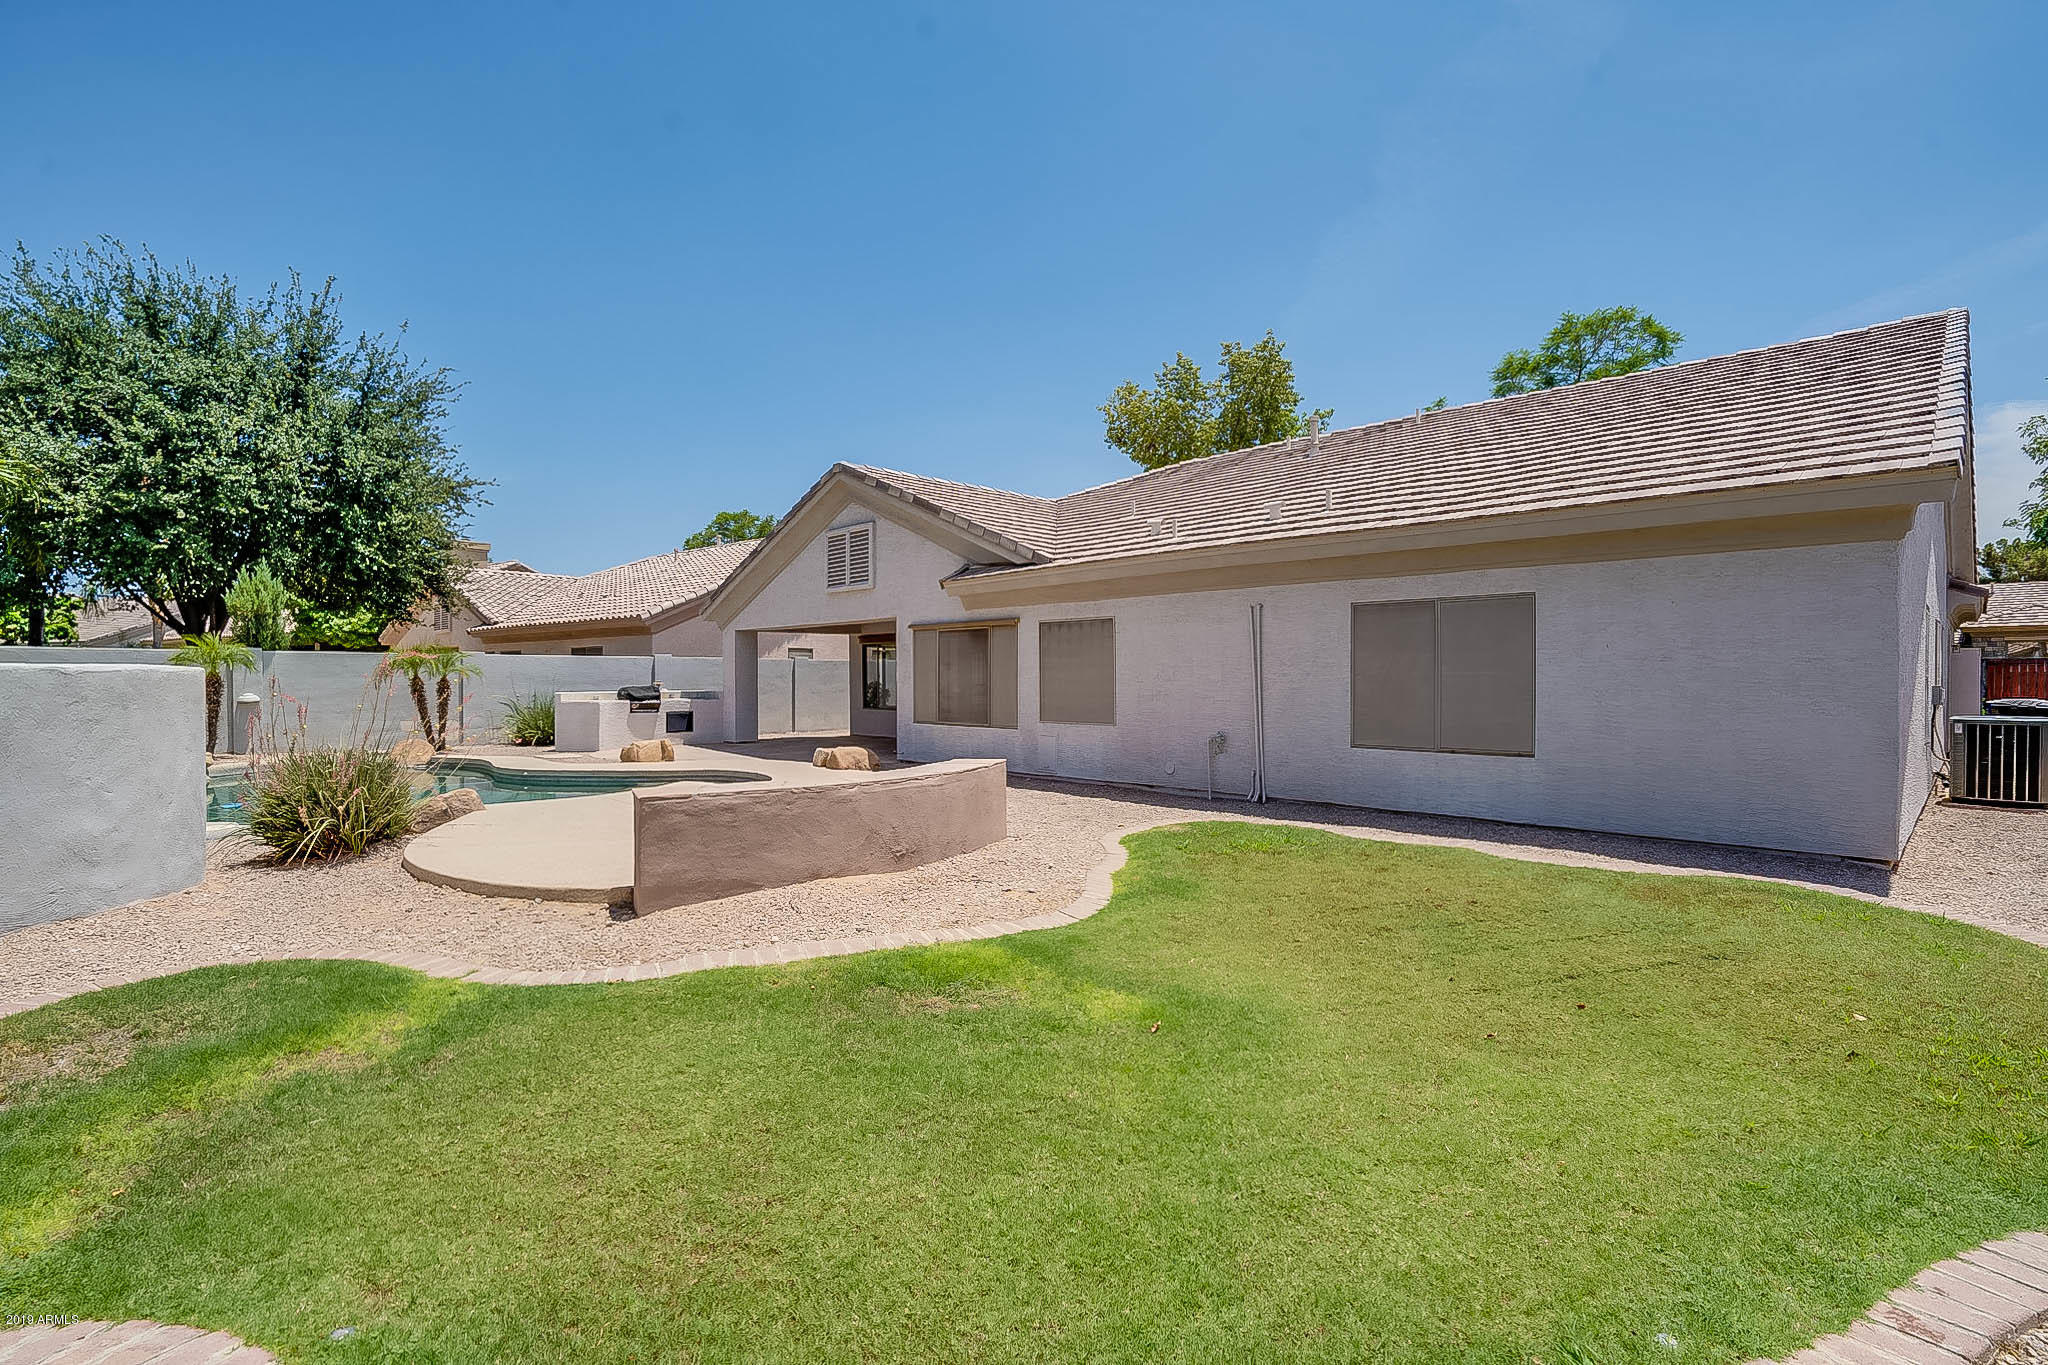 MLS 5954573 3710 S VISTA Place, Chandler, AZ 85248 Spyglass Bay